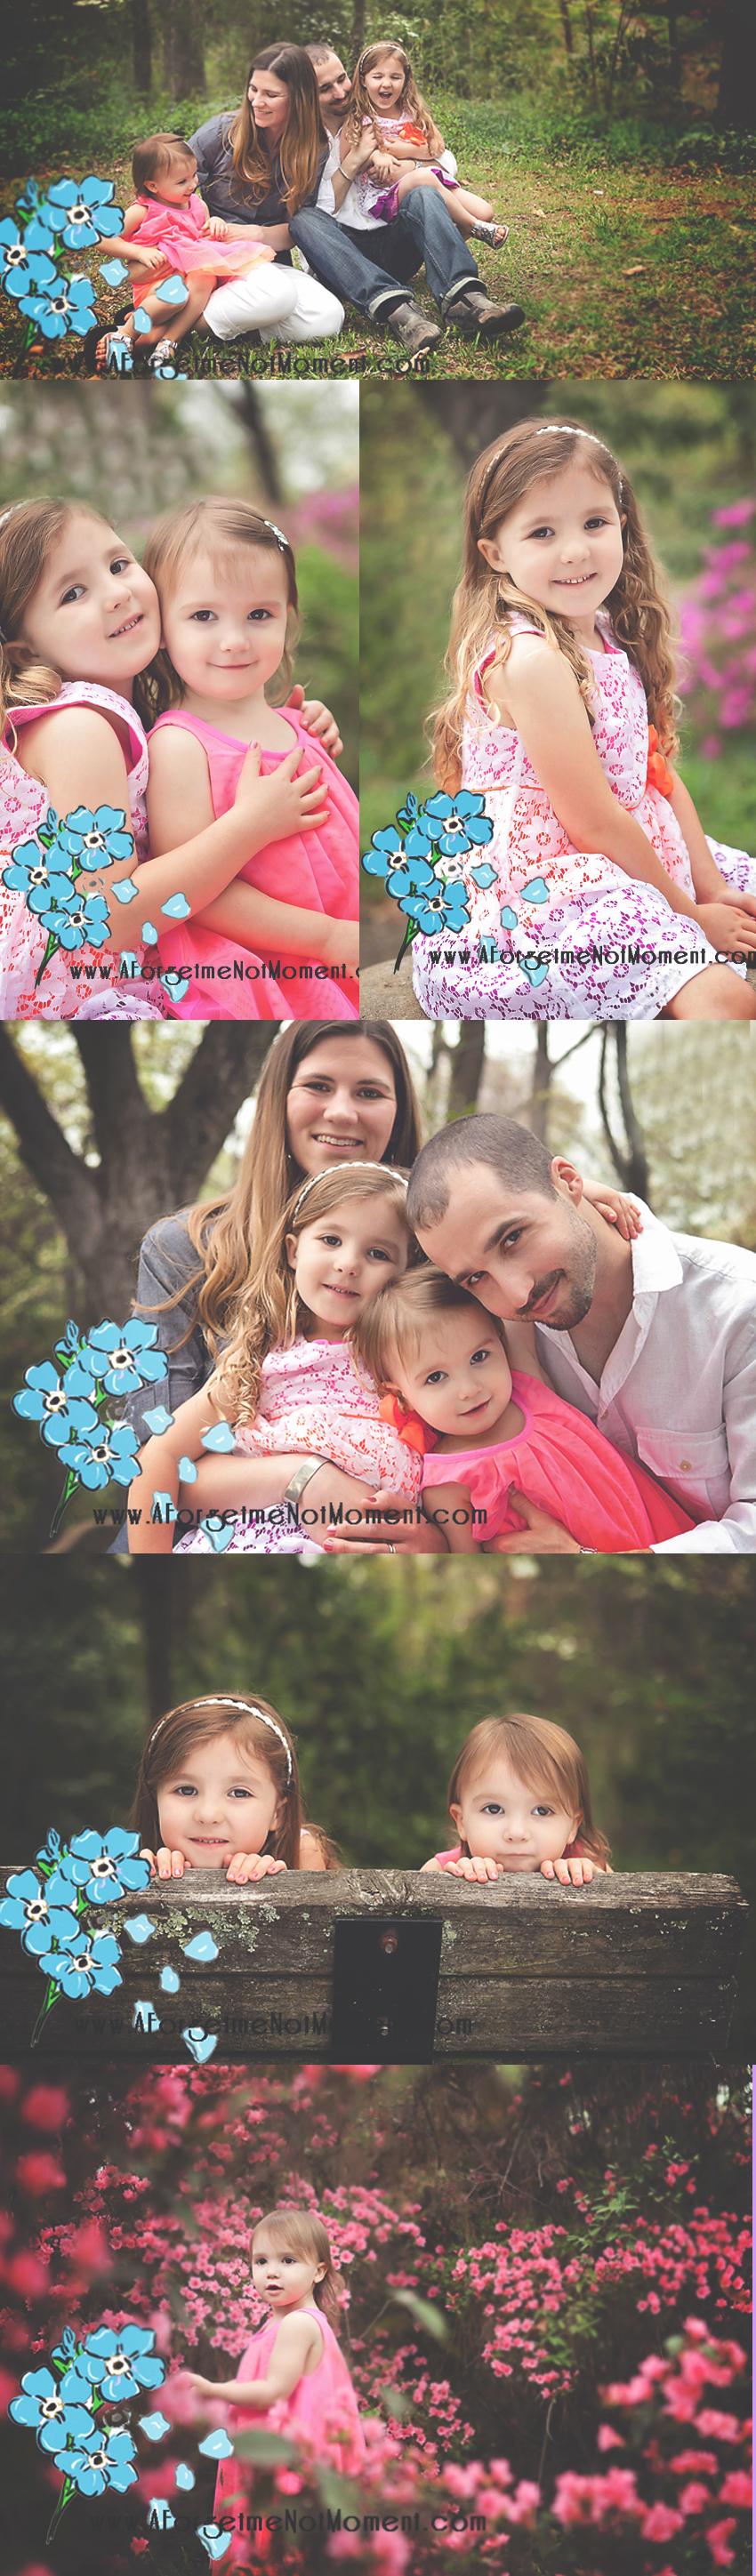 familyphotographerstudiocfamily